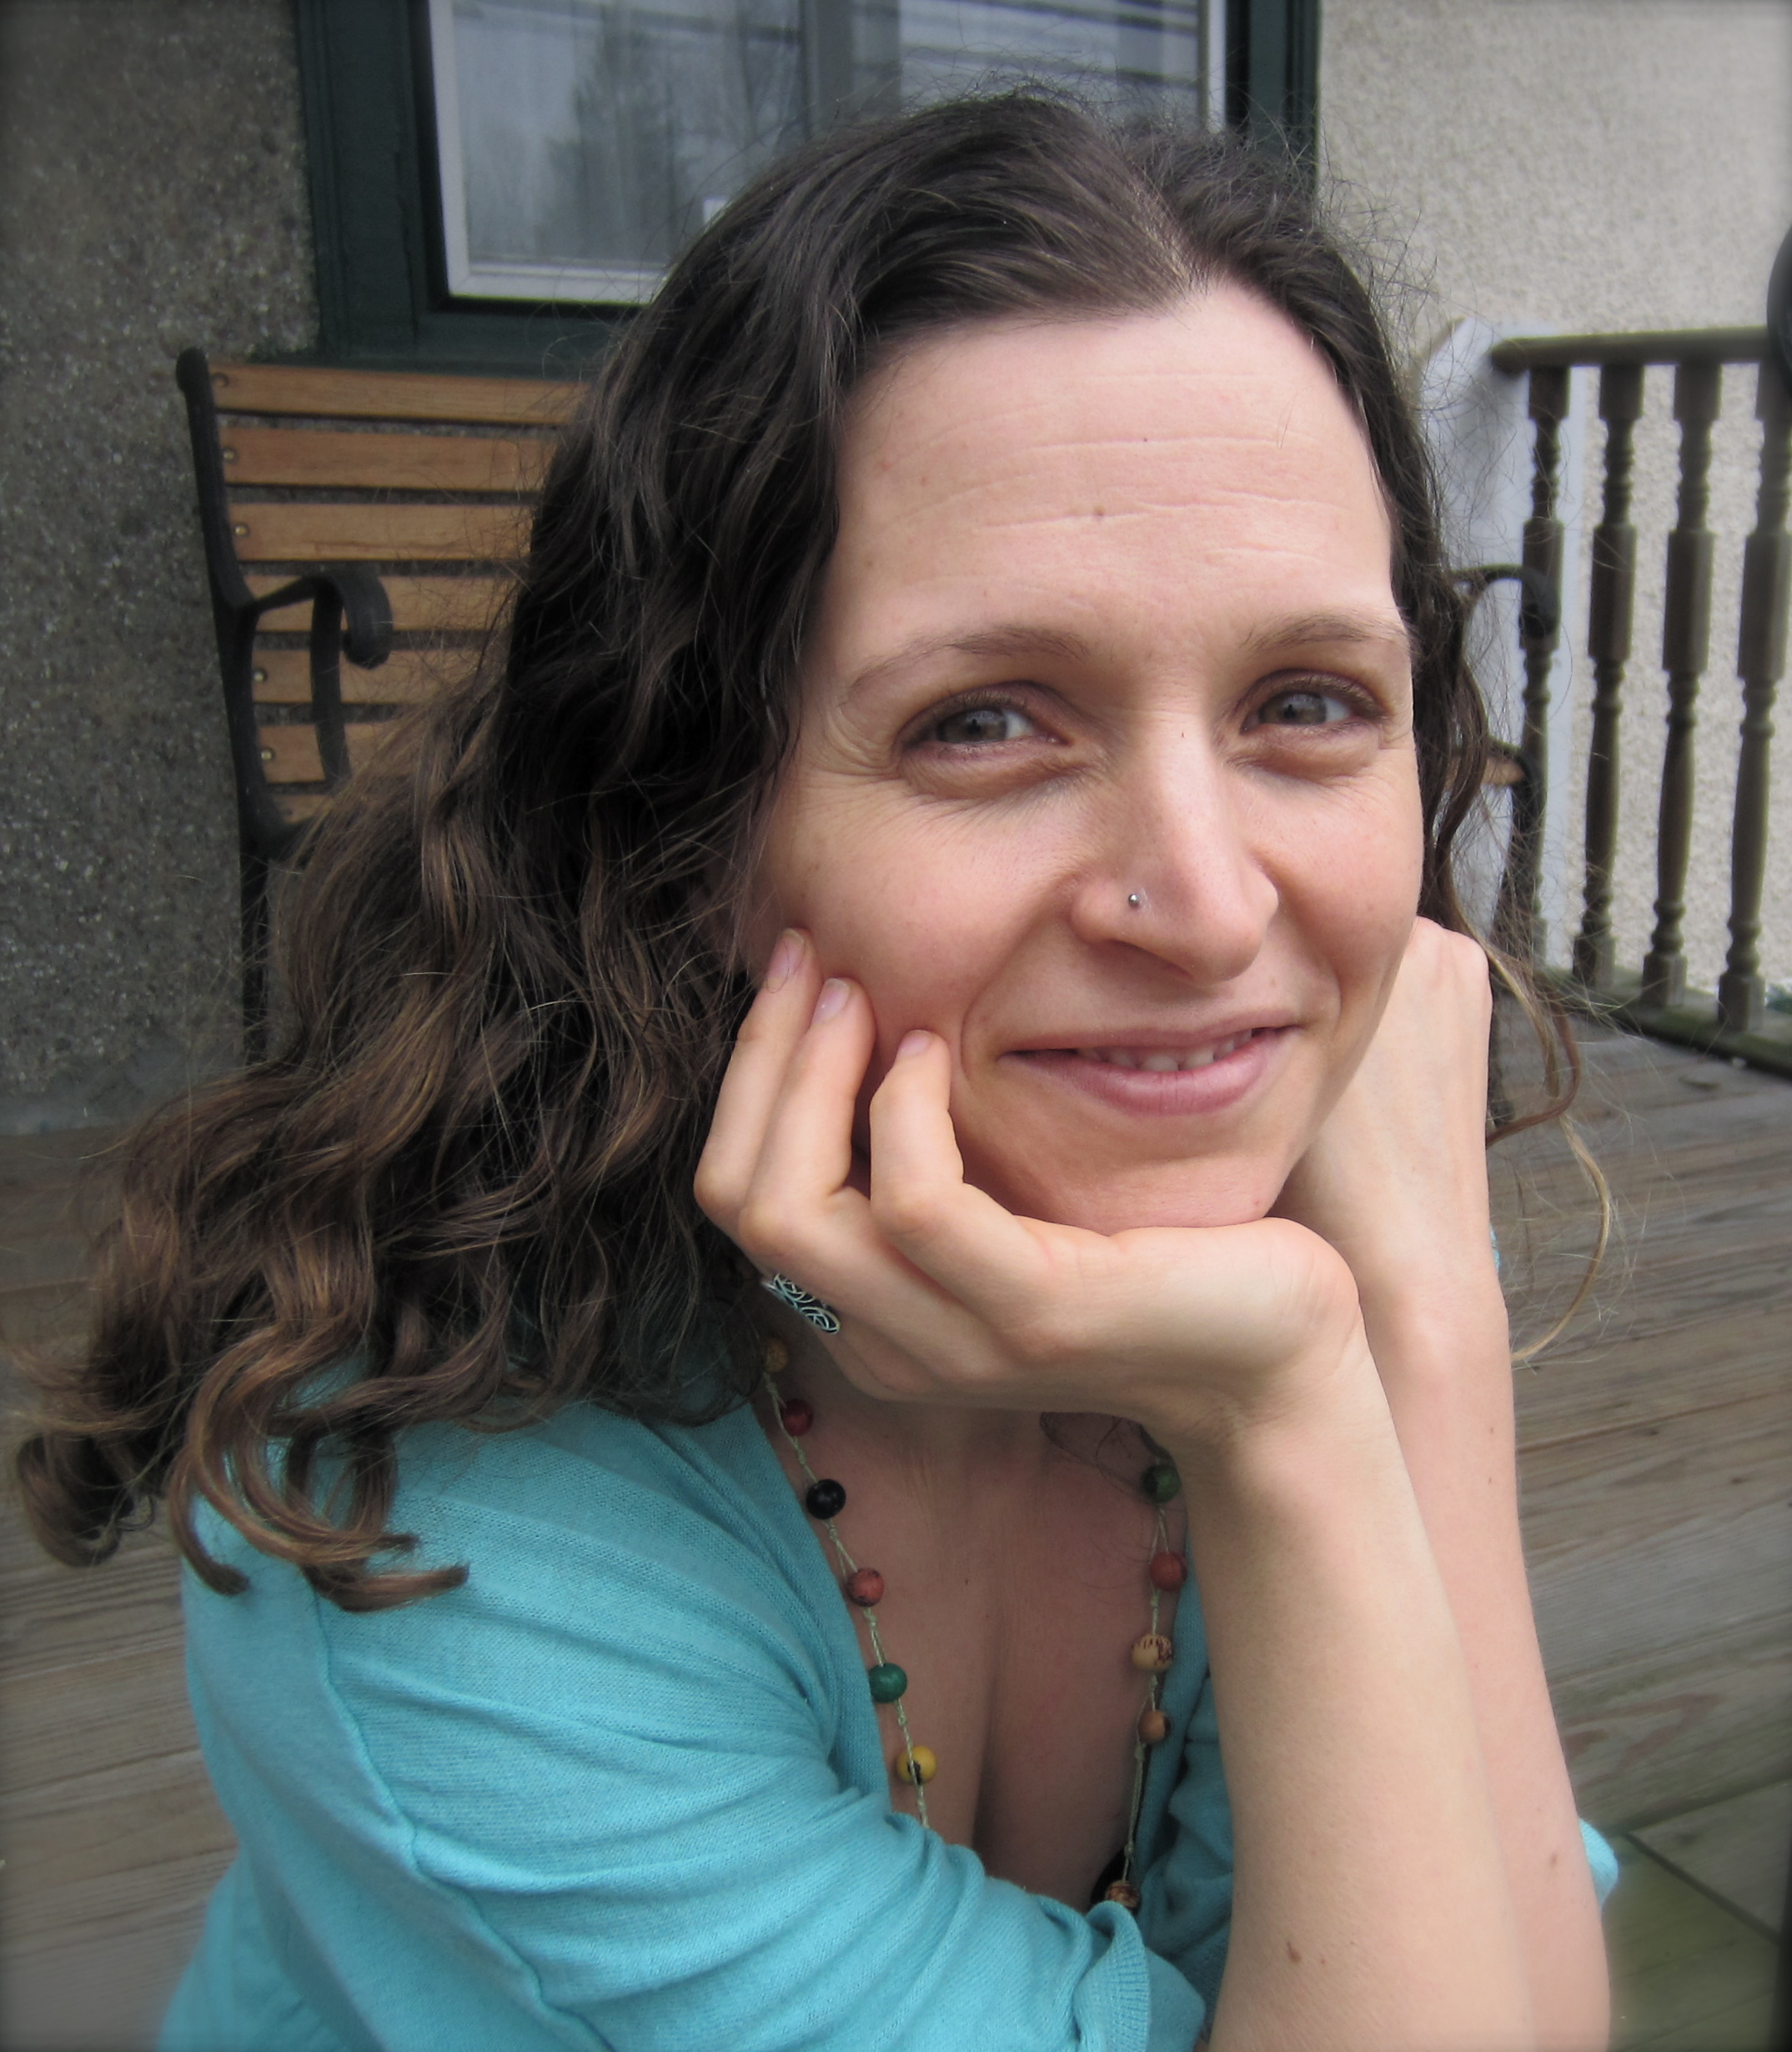 Michaela Watkins,Juliet Cowan Hot fotos Jeisa Chiminazzo BRA 2006,Tracey Ullman (born 1959 (naturalized American citizen)